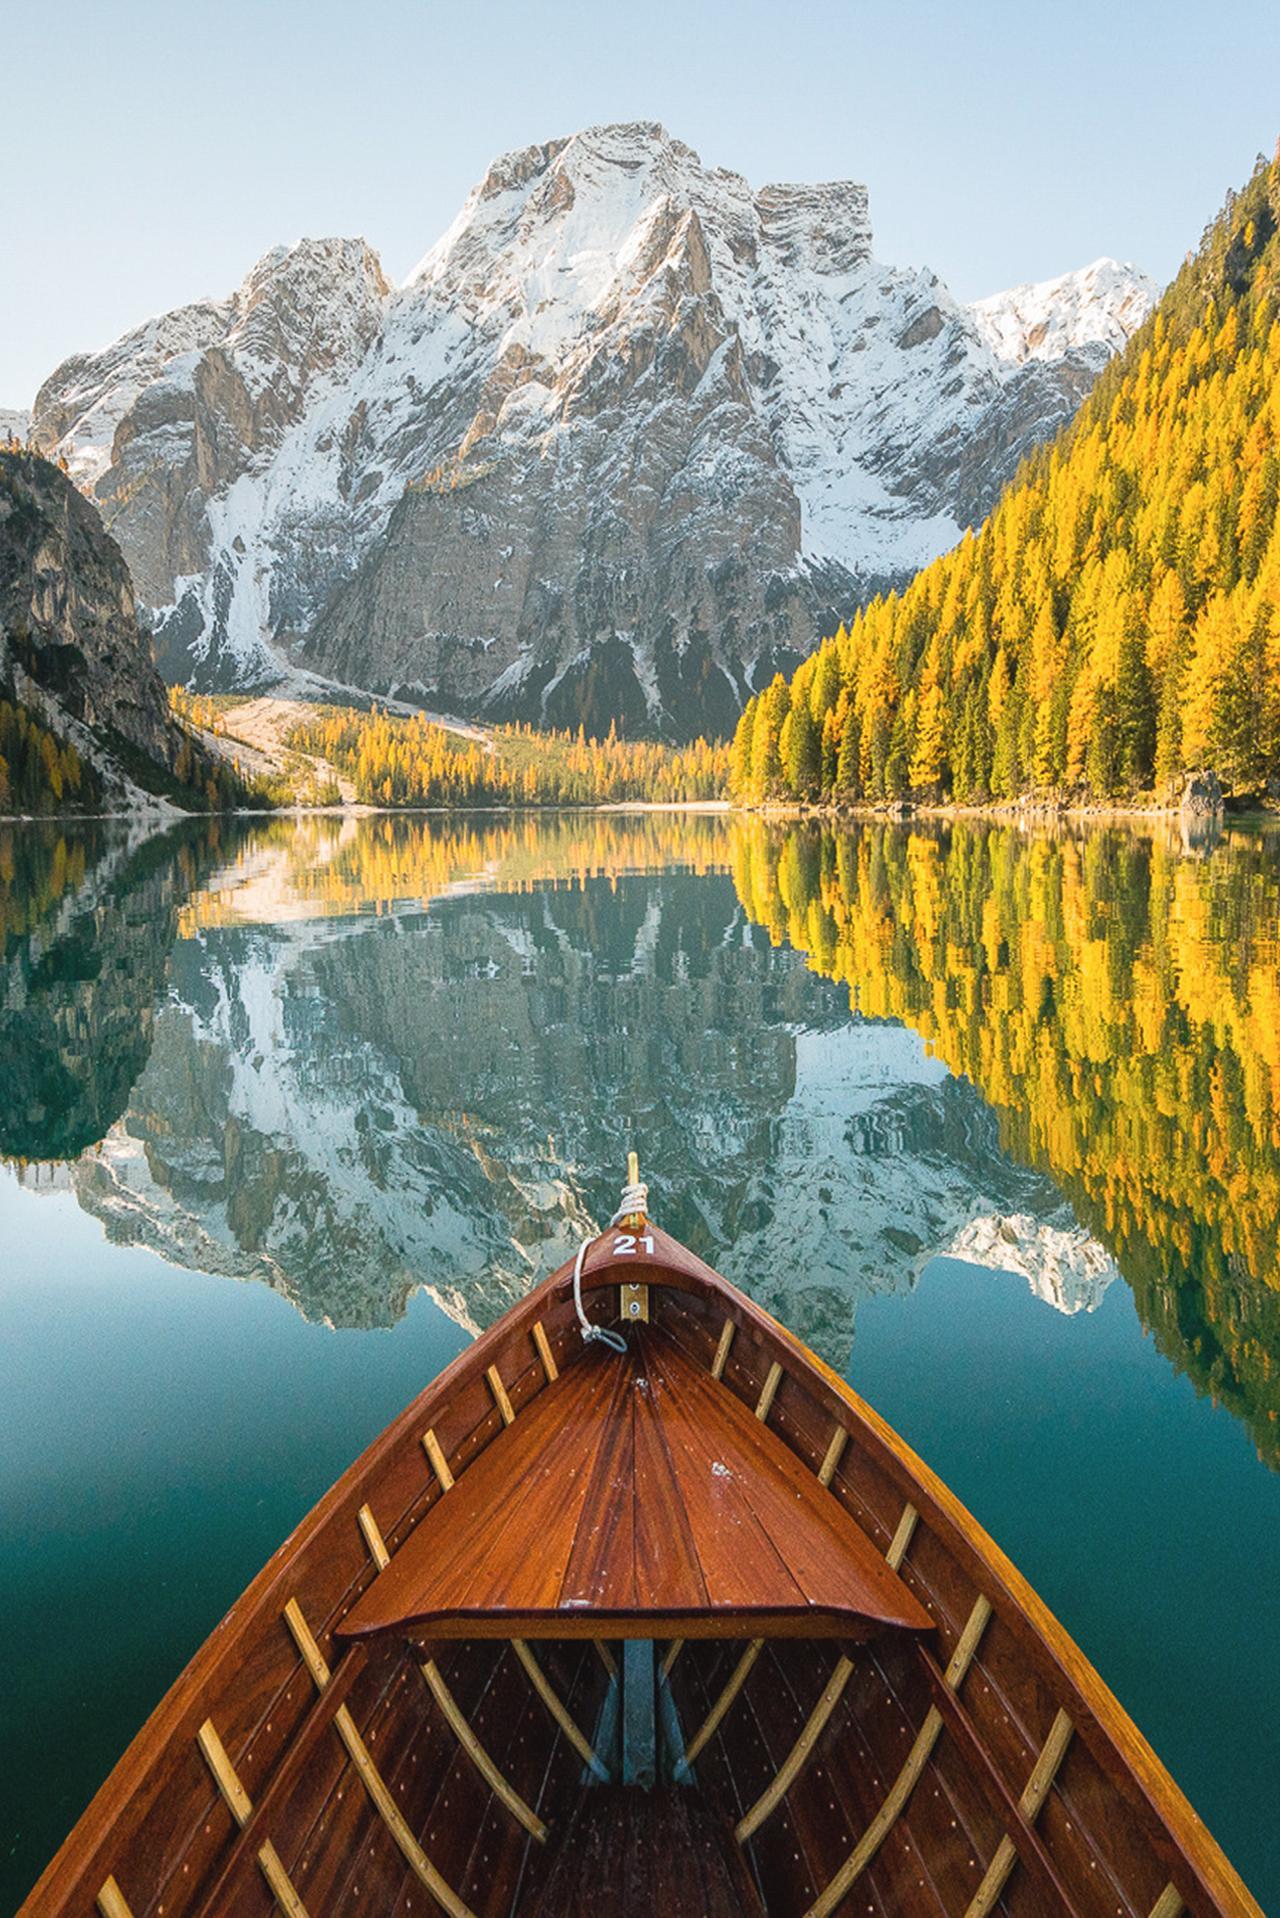 lake mountain boat reflection landscape summer tree sun travel water